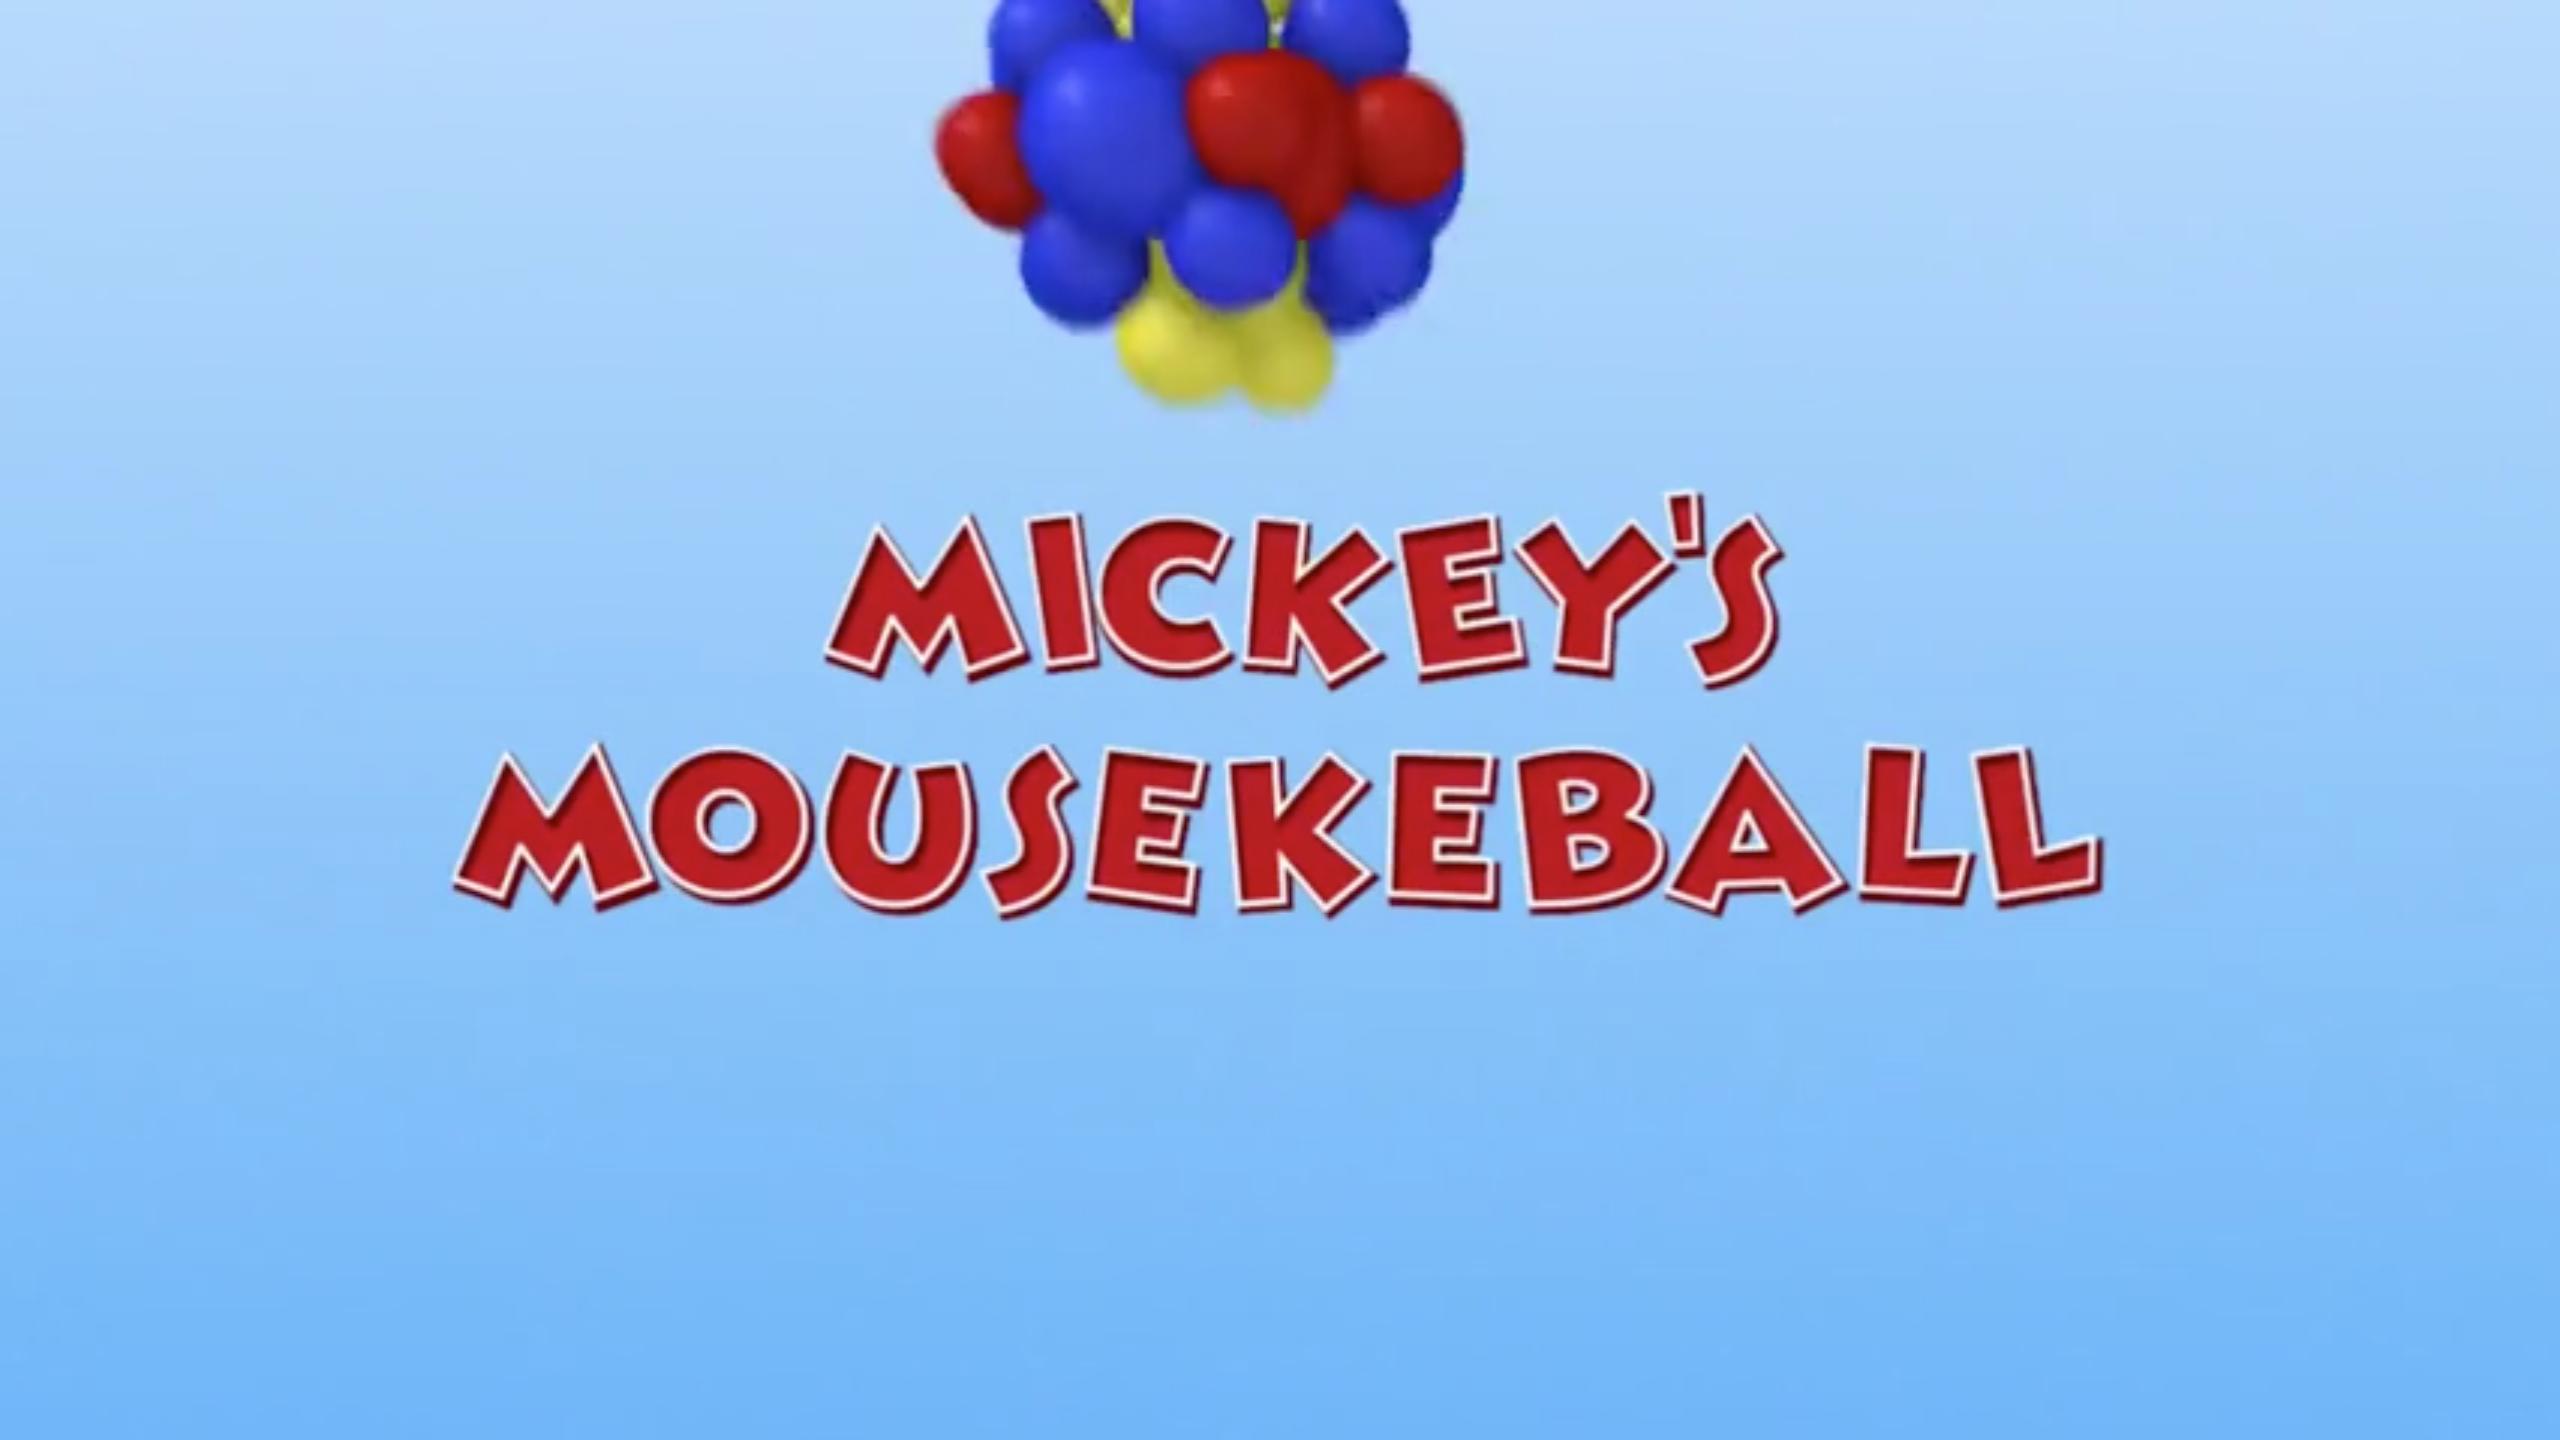 Mickey's Mousekeball